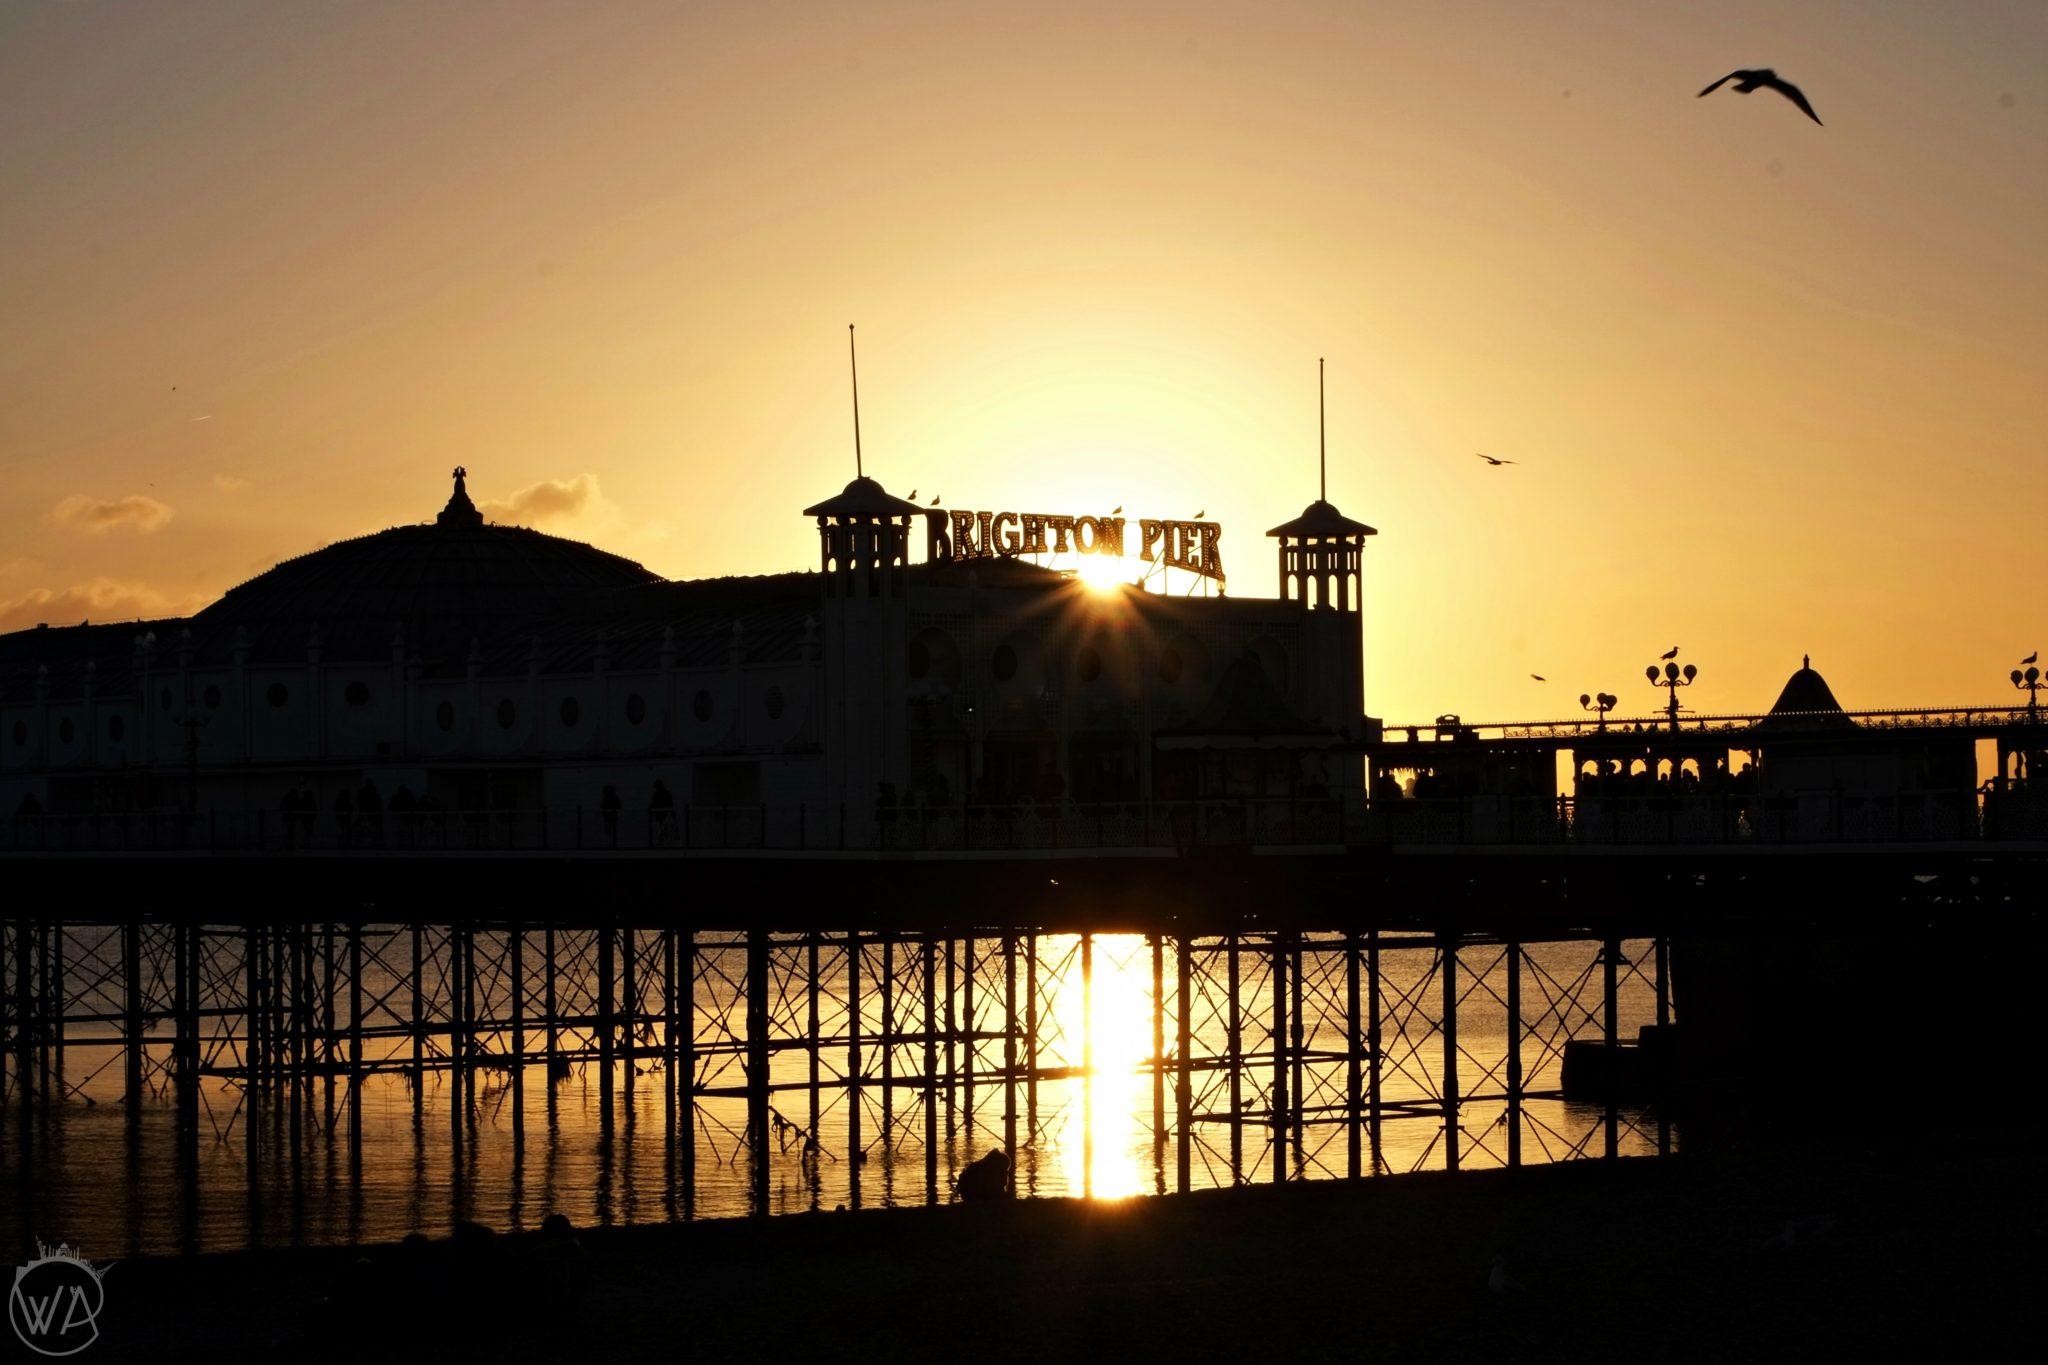 brighton pier in the evening